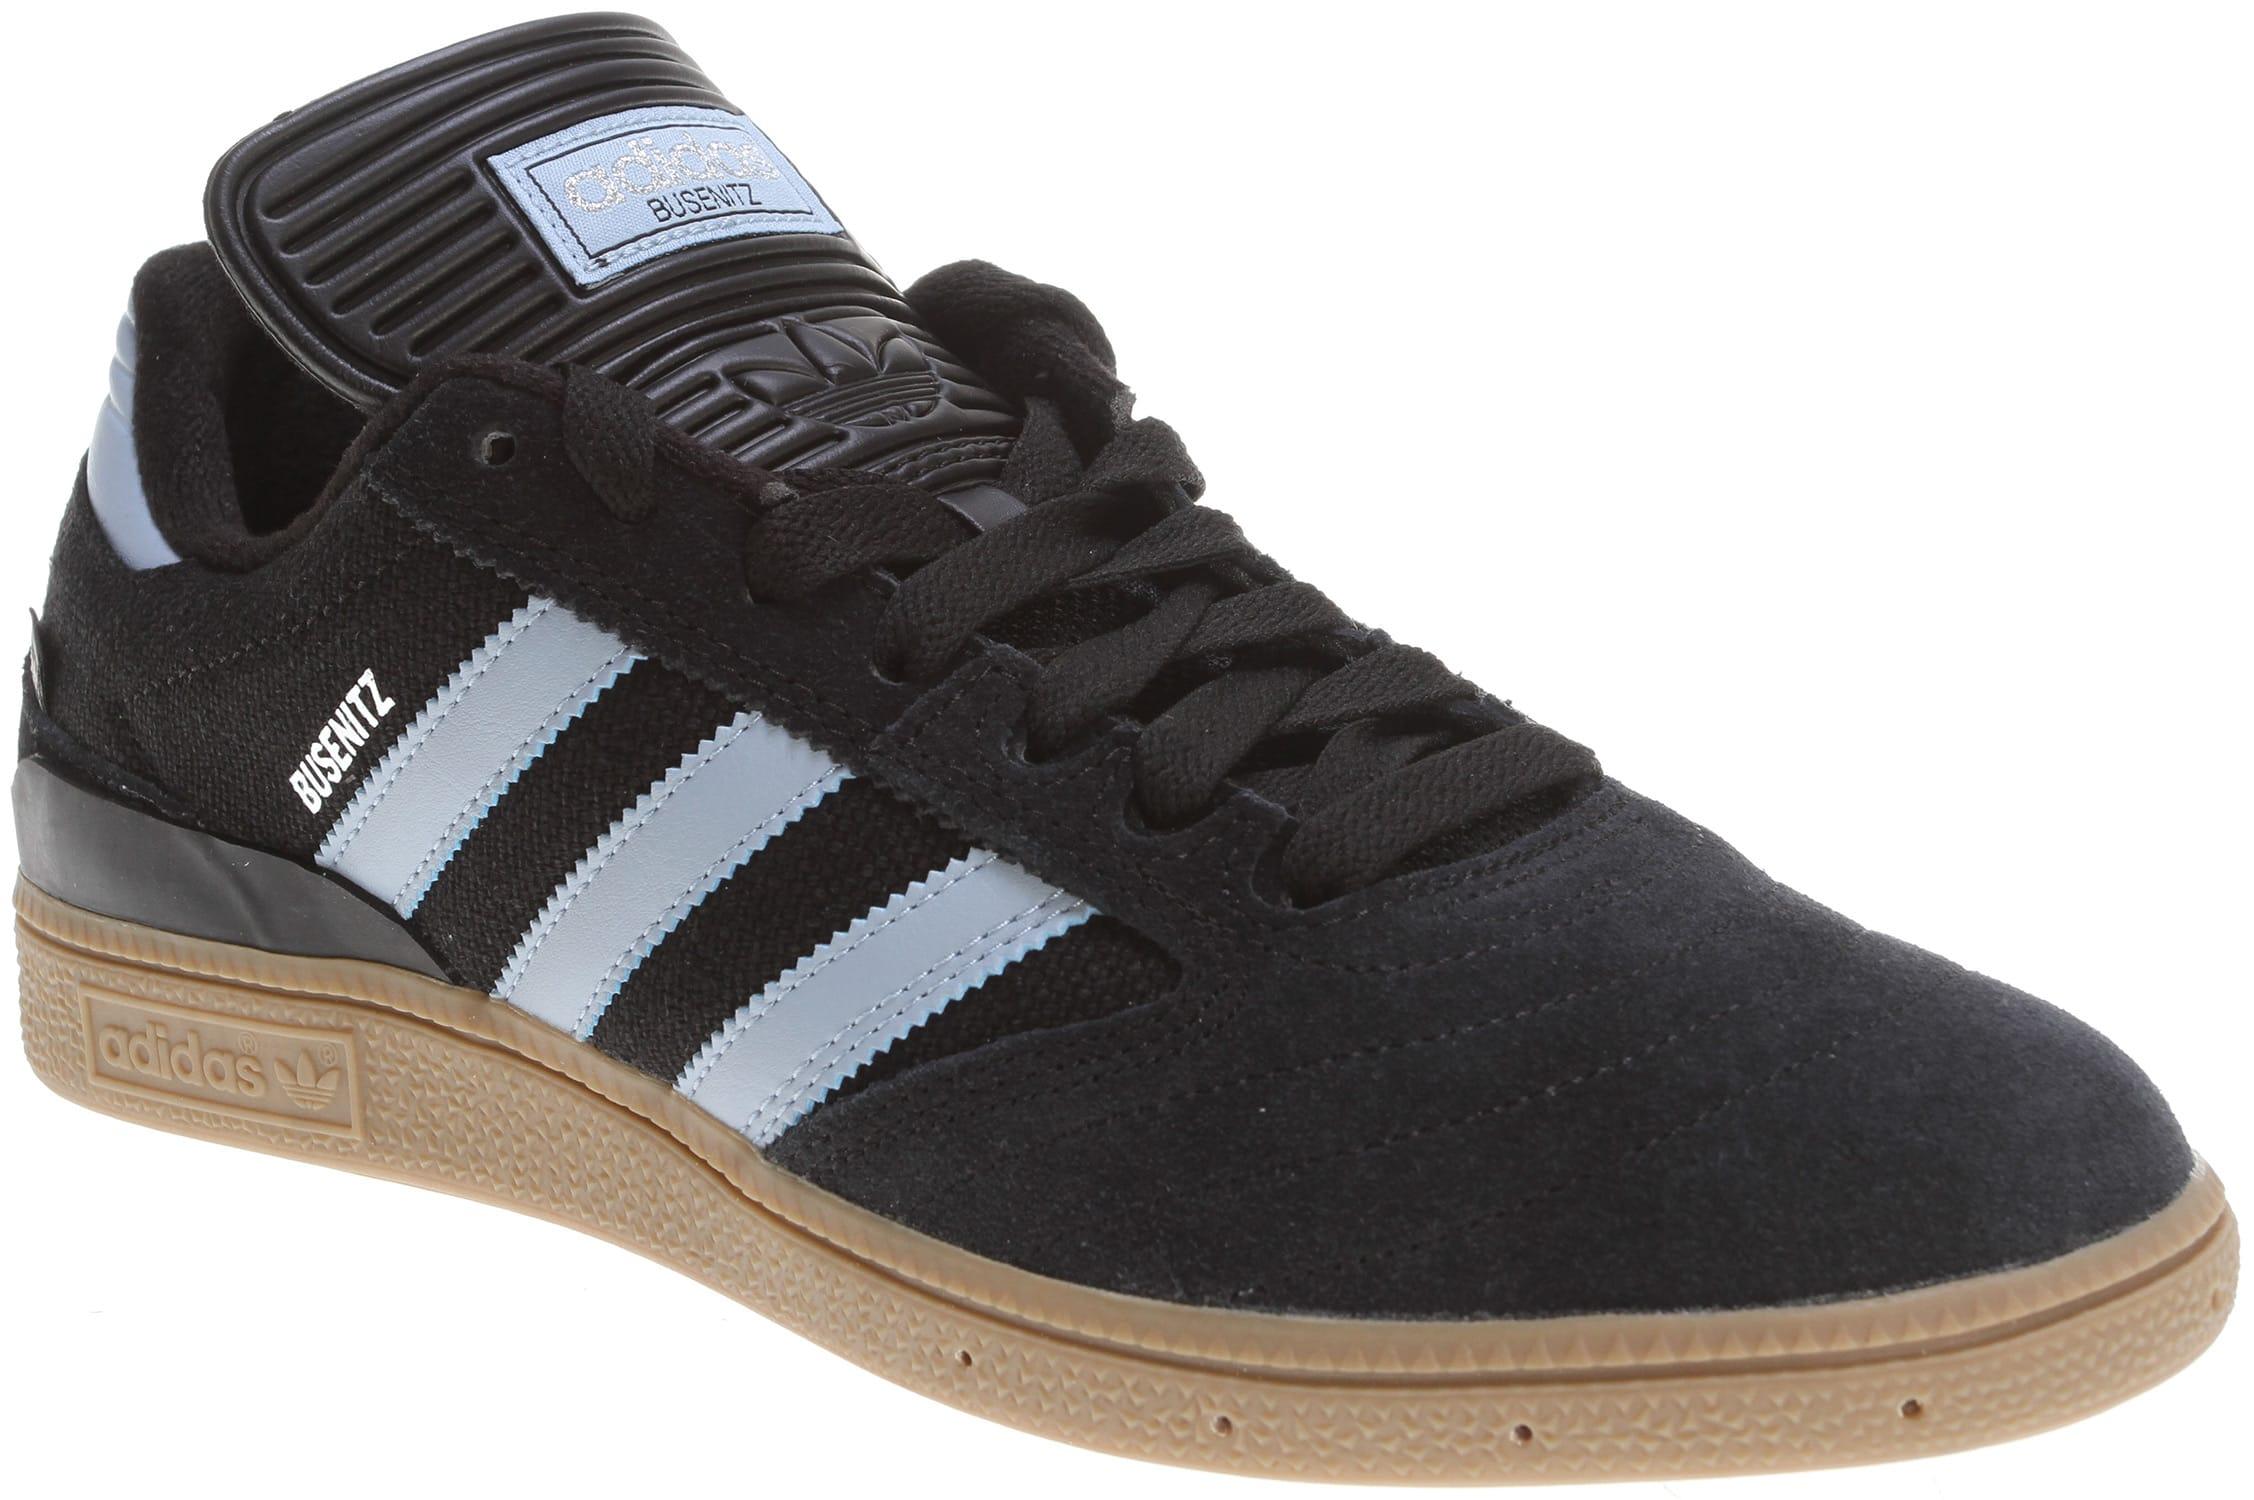 En venta Adidas Busenitz pro skate zapatos hasta 50% de descuento